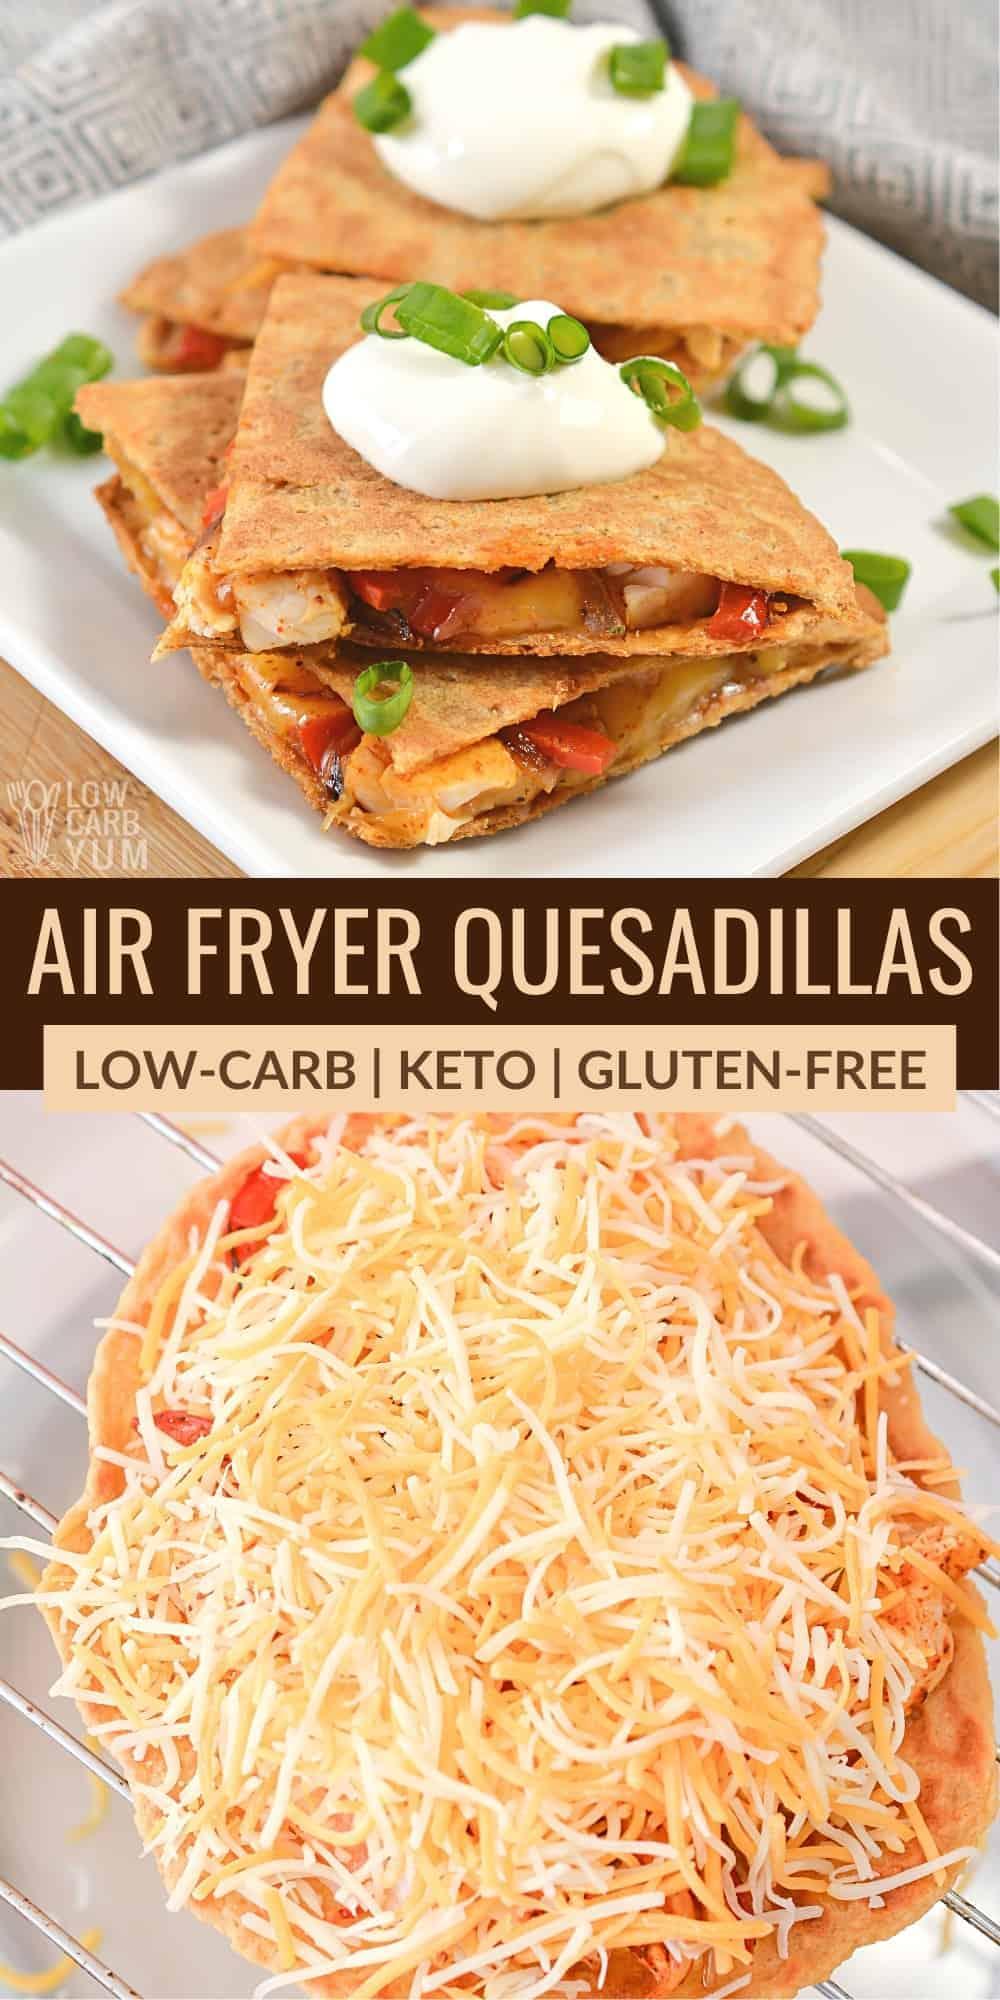 air fryer quesadillas pinterest image